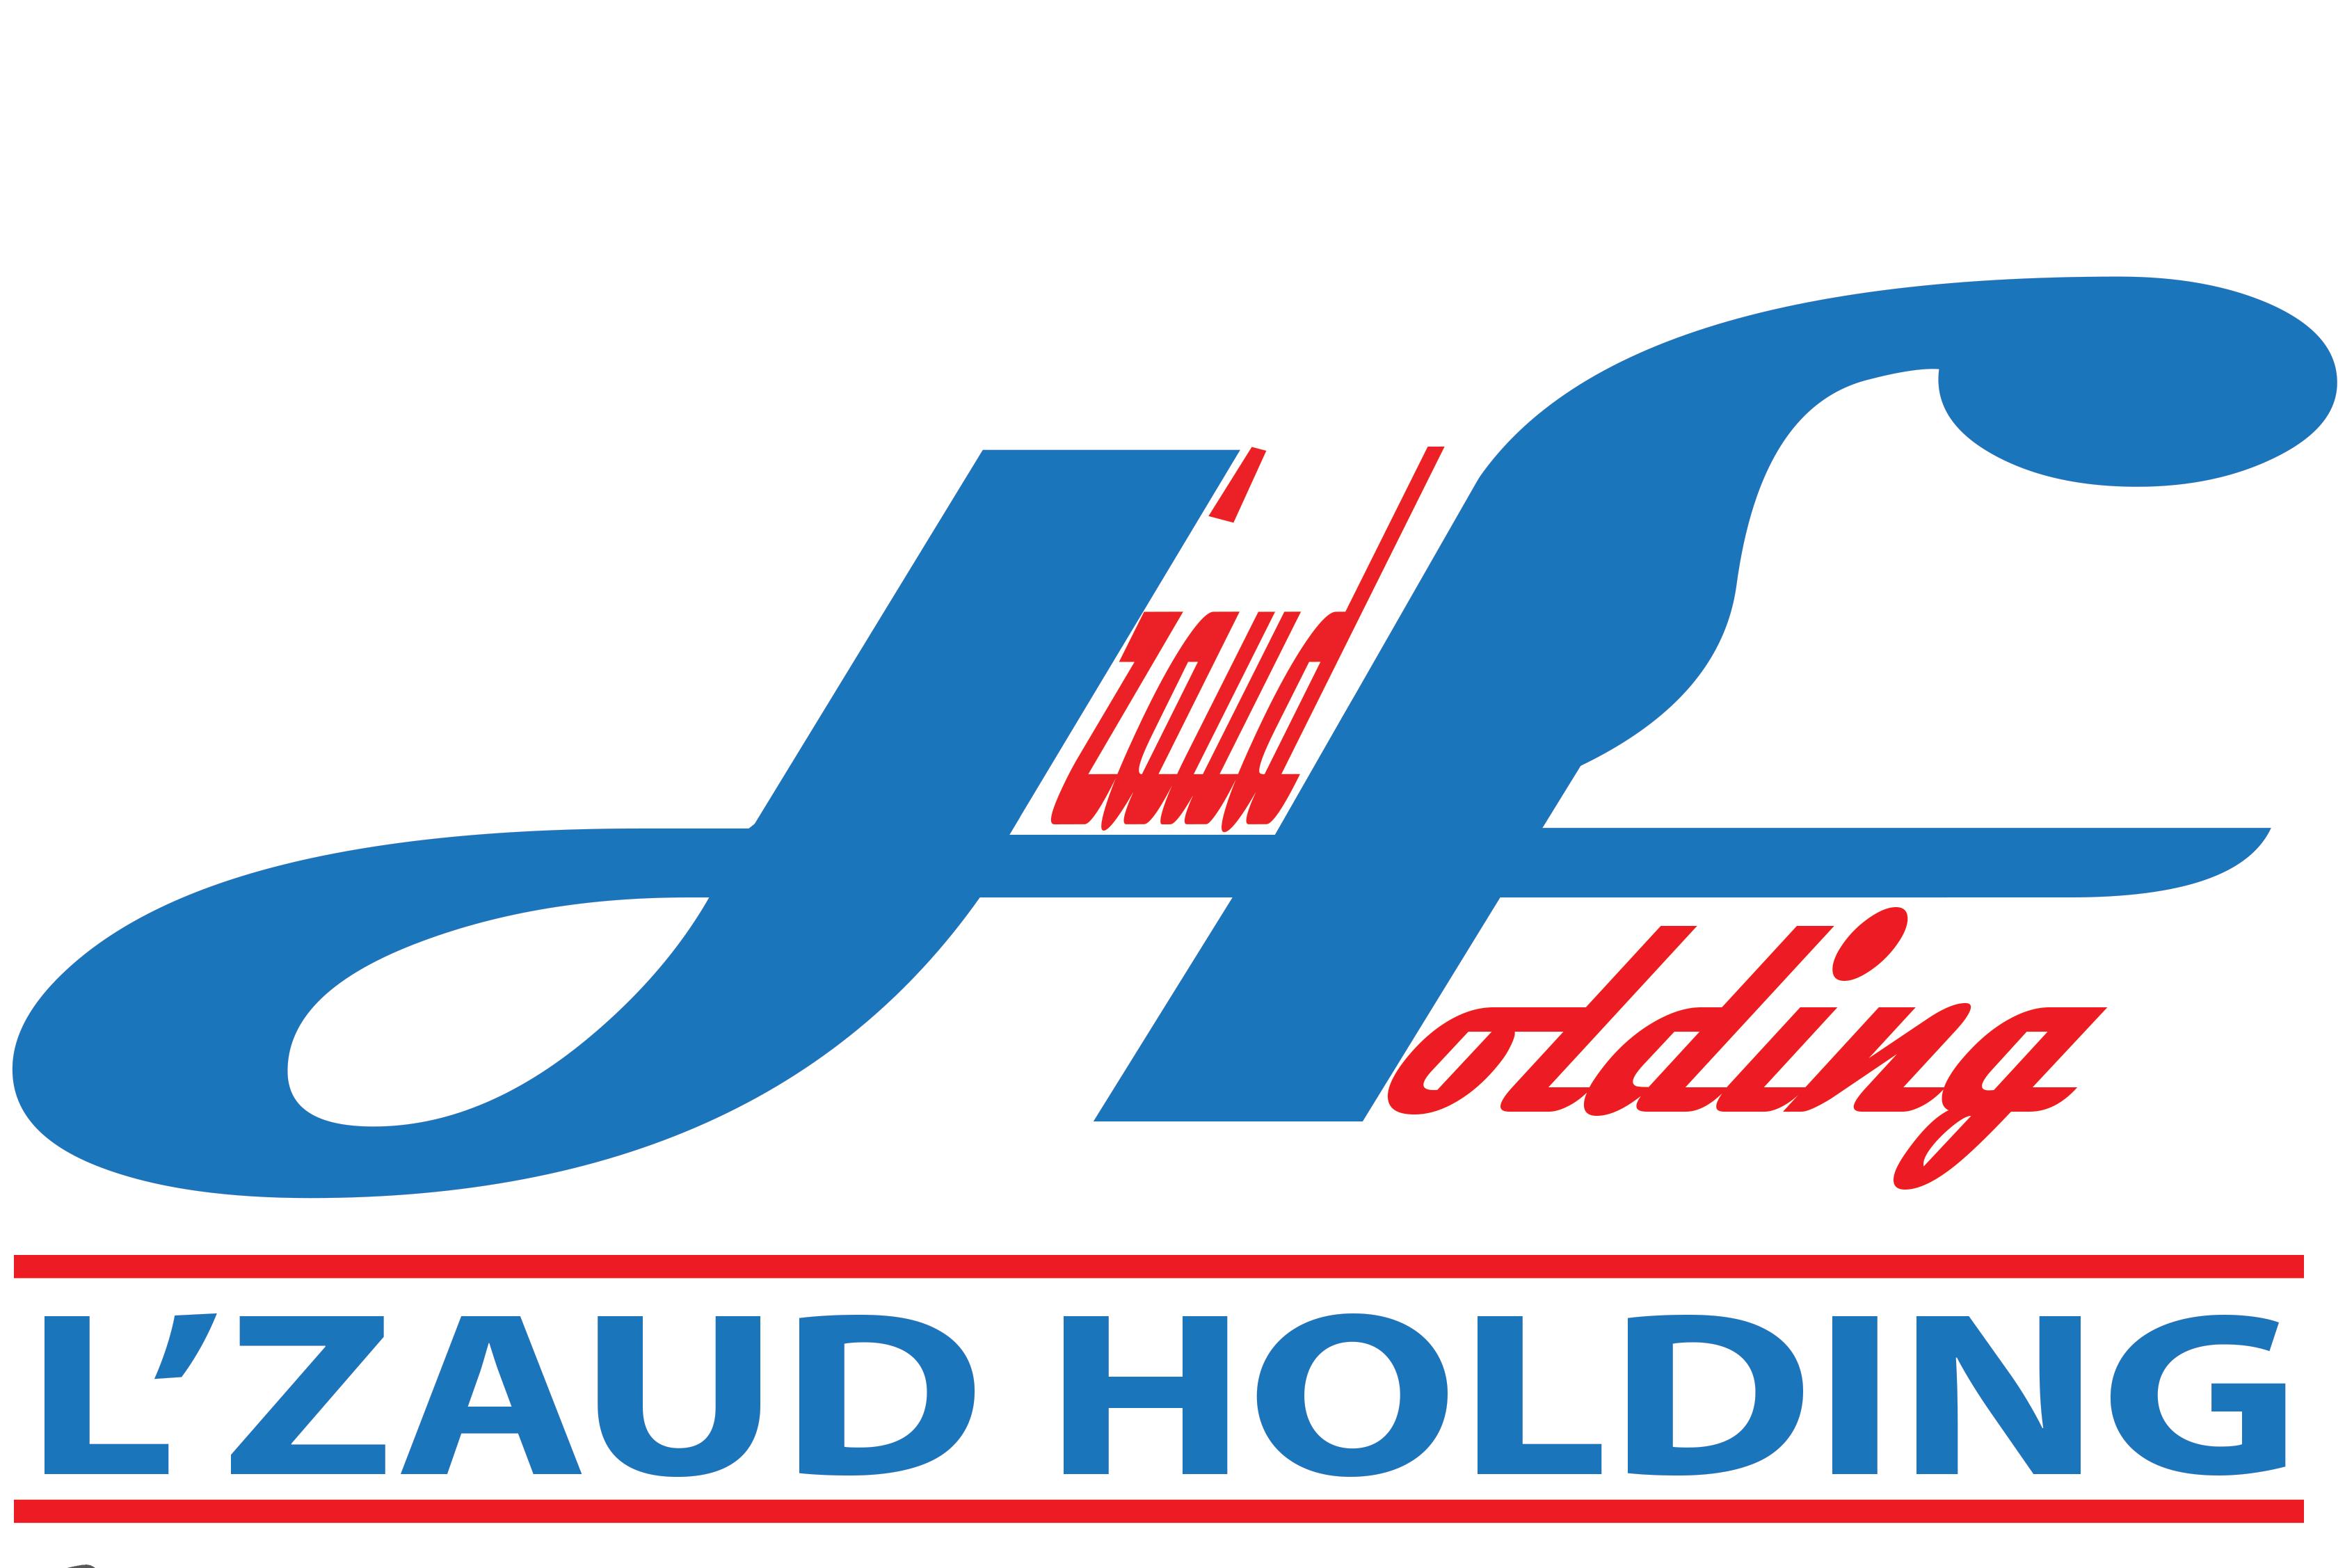 L'ZAUD HOLDING